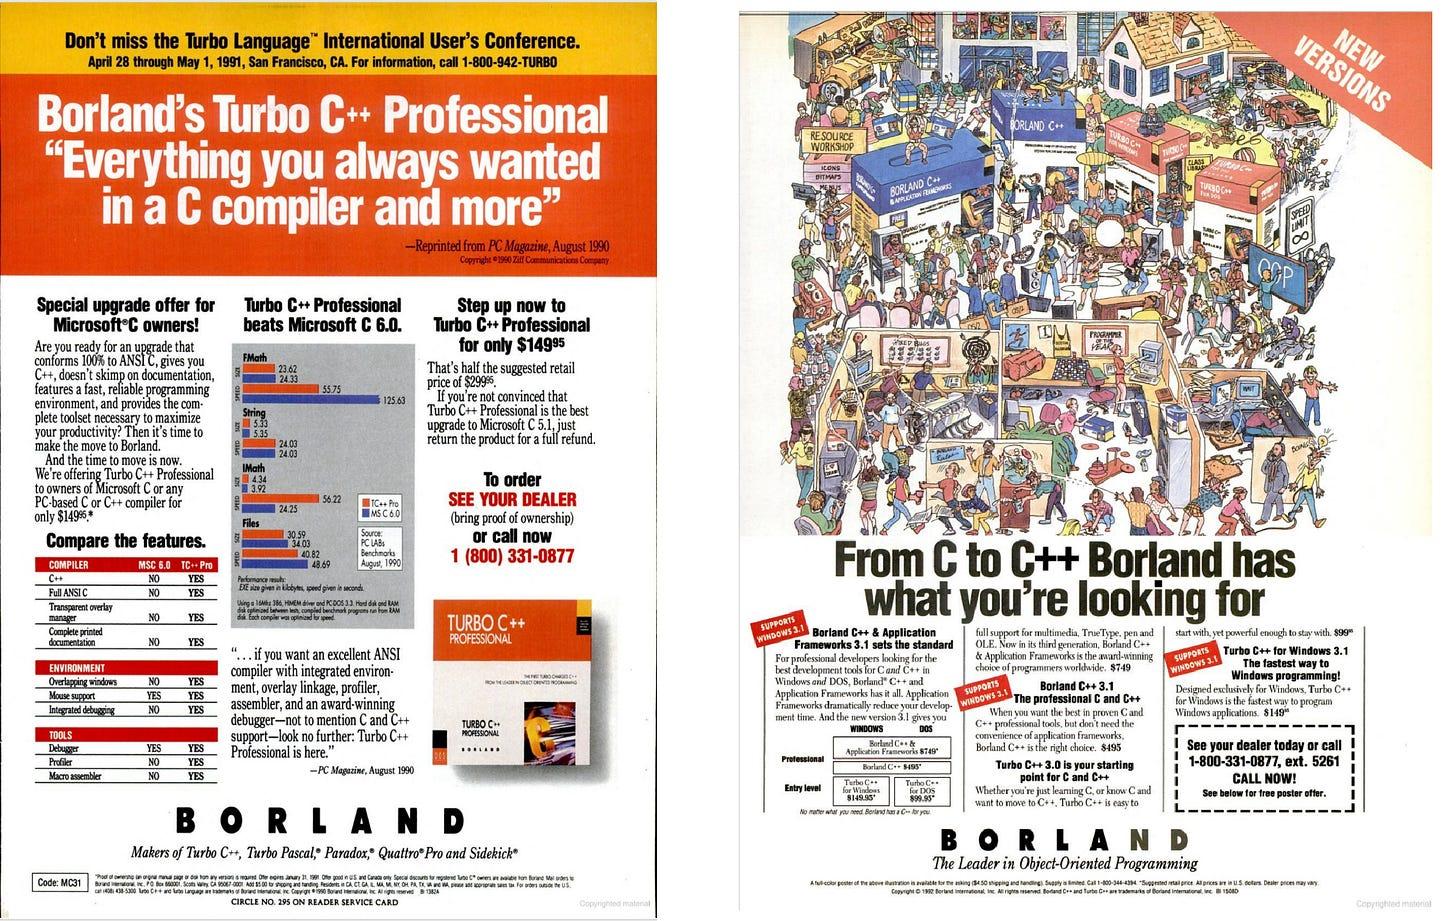 Advertisements for Borland C++